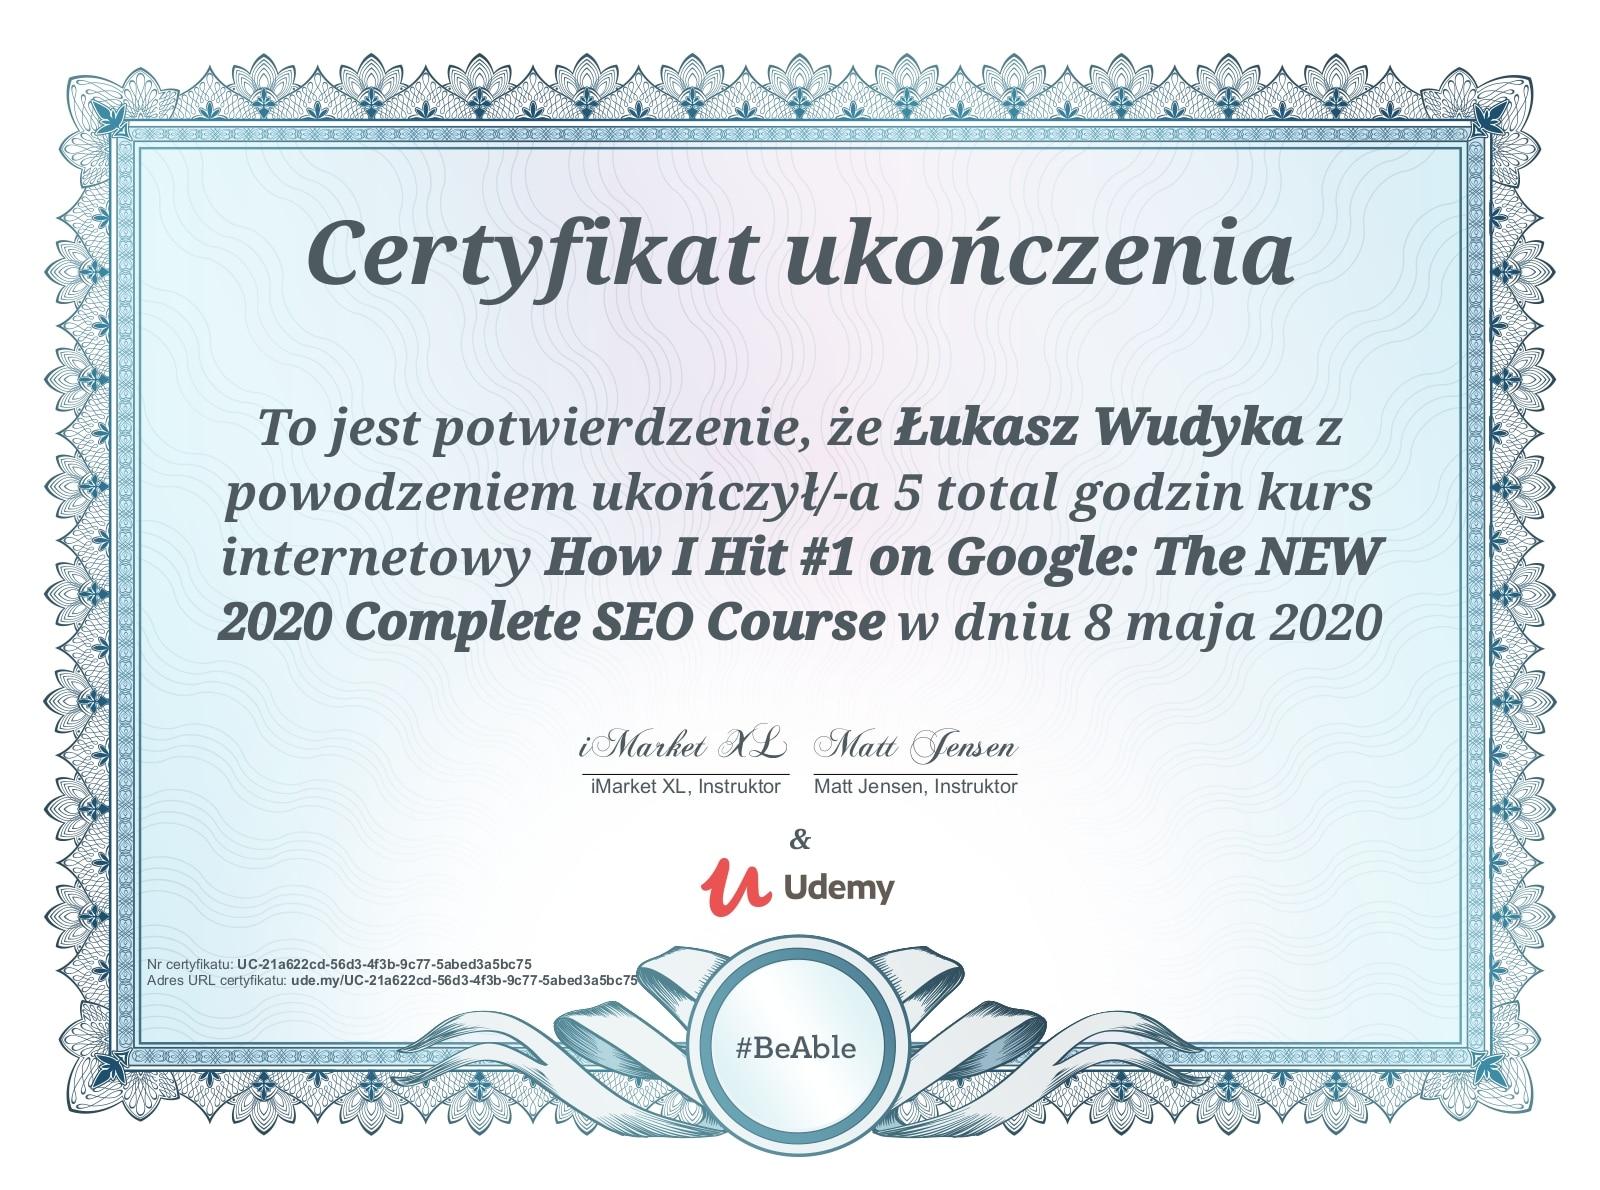 Łukasz Wudyka certyfikat UDEMY - How I Hit #1 on Google: The NEW 2020 coplete SEO Course